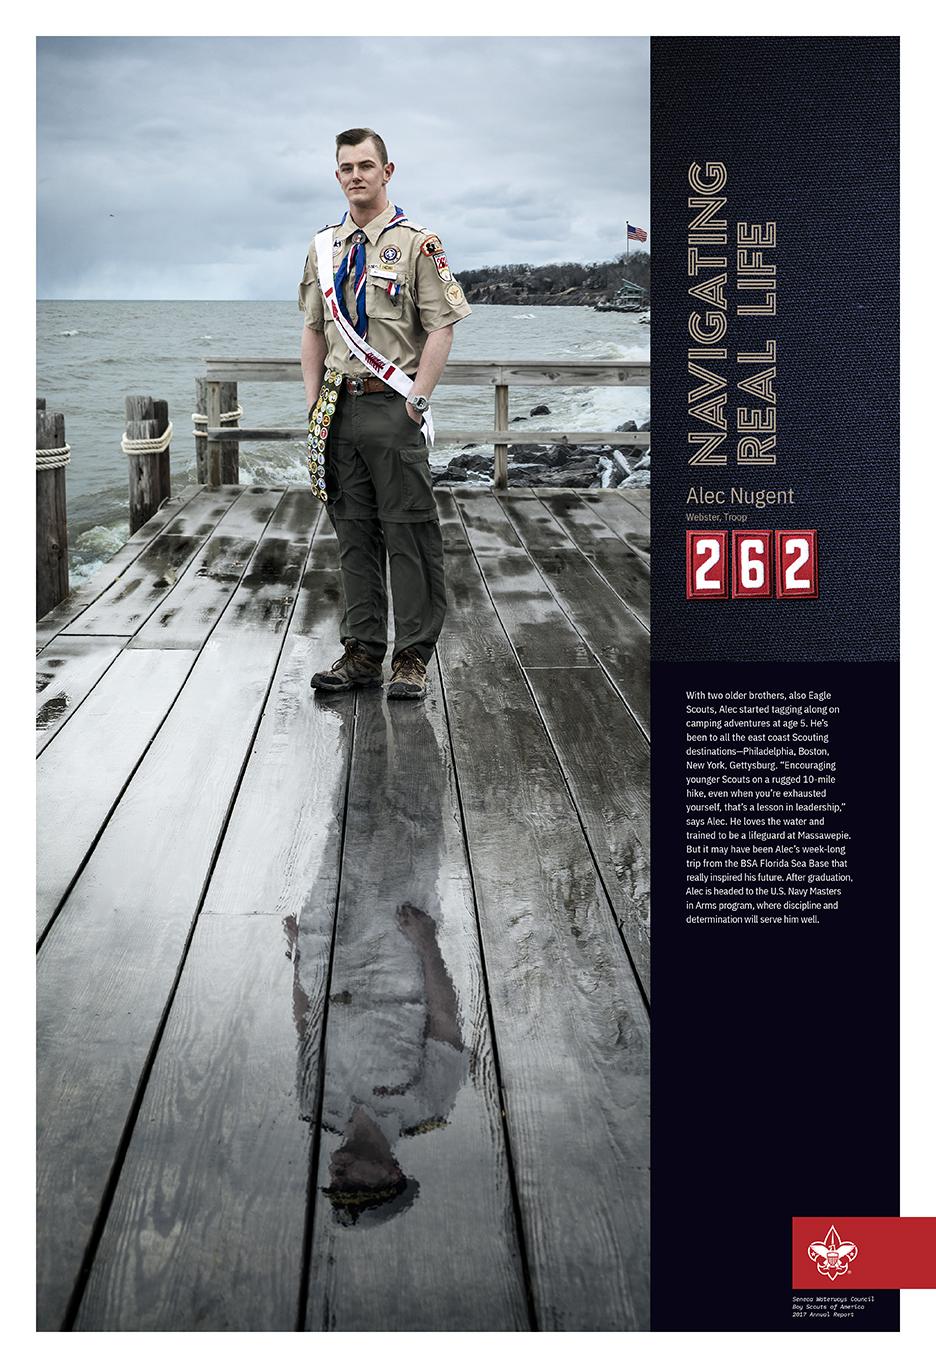 PBNO-1802 Boy Scout 2017 Posters 13x19_Part1.jpg